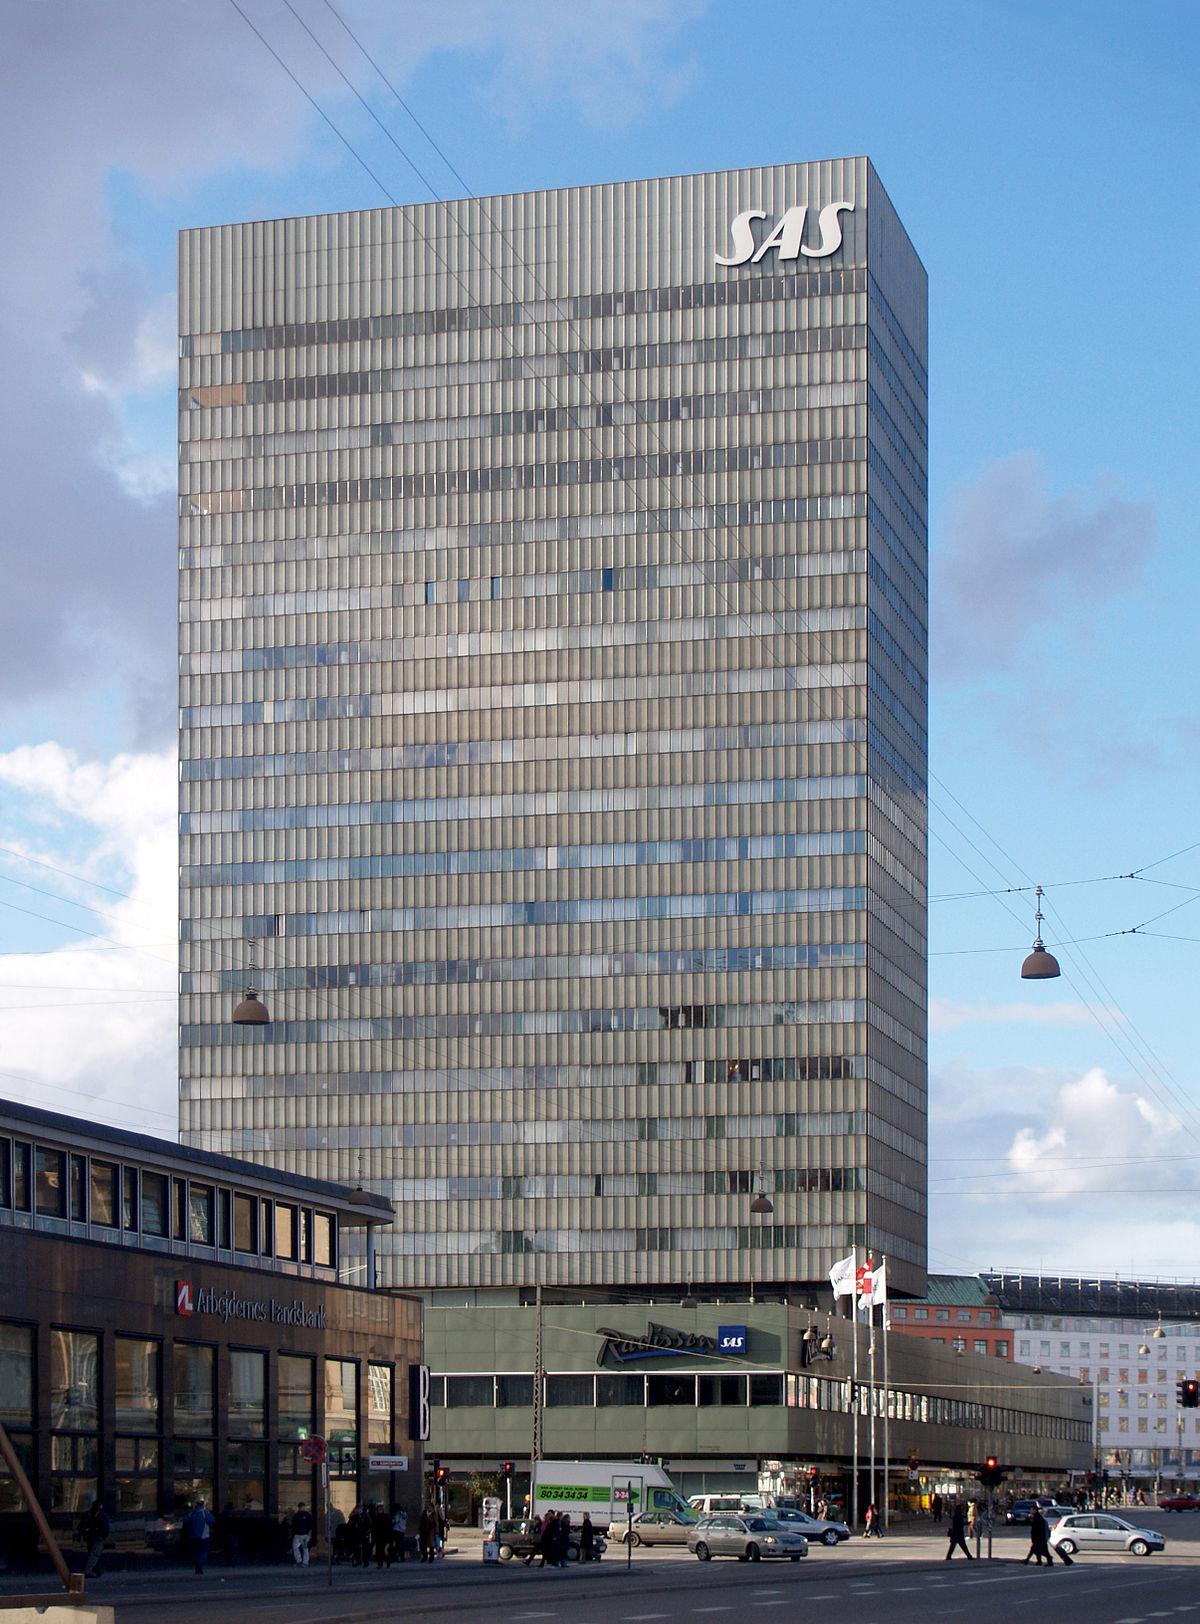 1200px-SAS_Royal_Hotel,_Copenhagen,_1955-1960